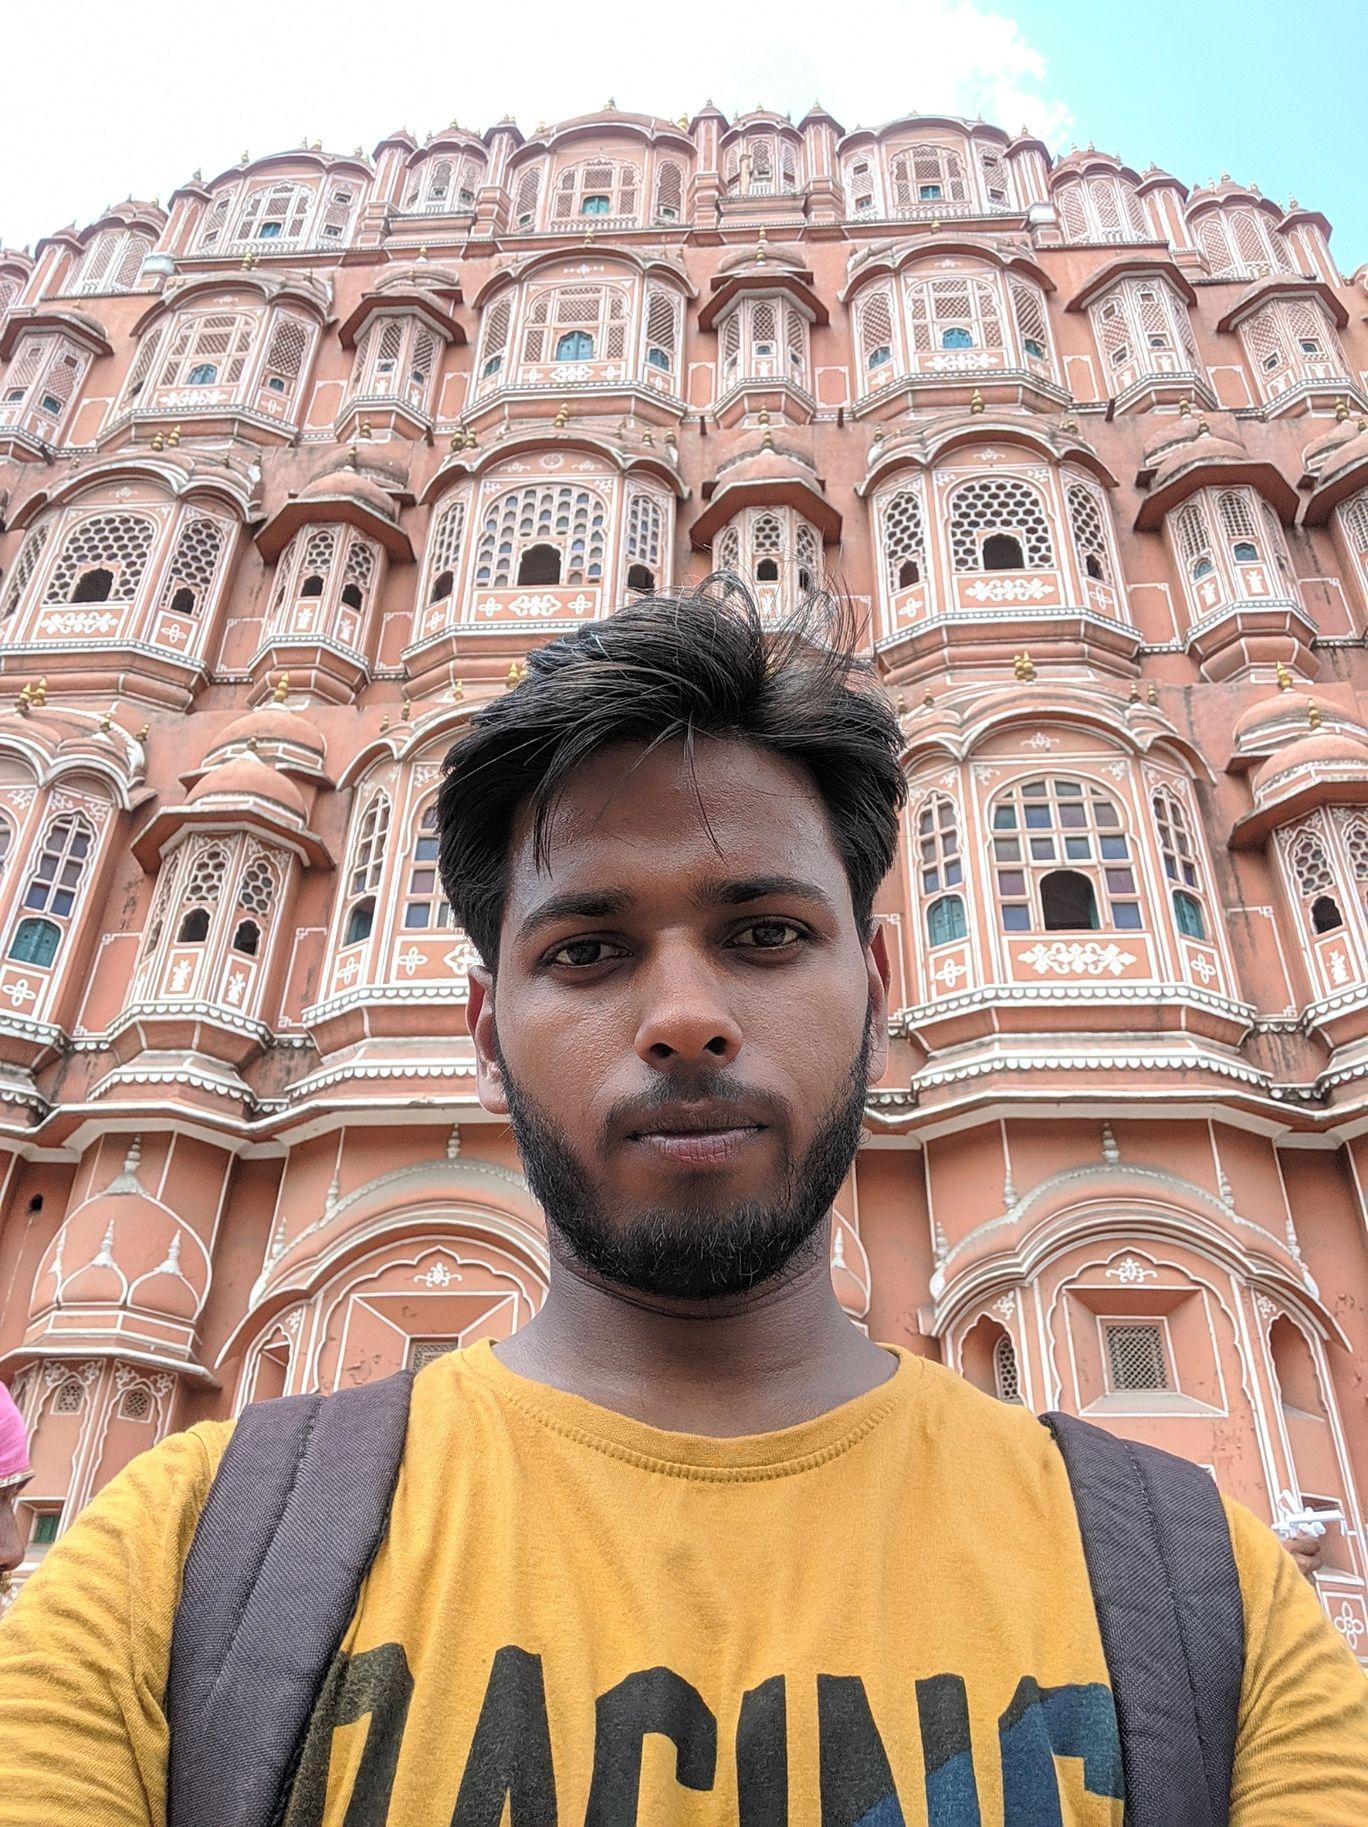 Photo of Hawa Mahal - Palace of Wind By Shubham Saini